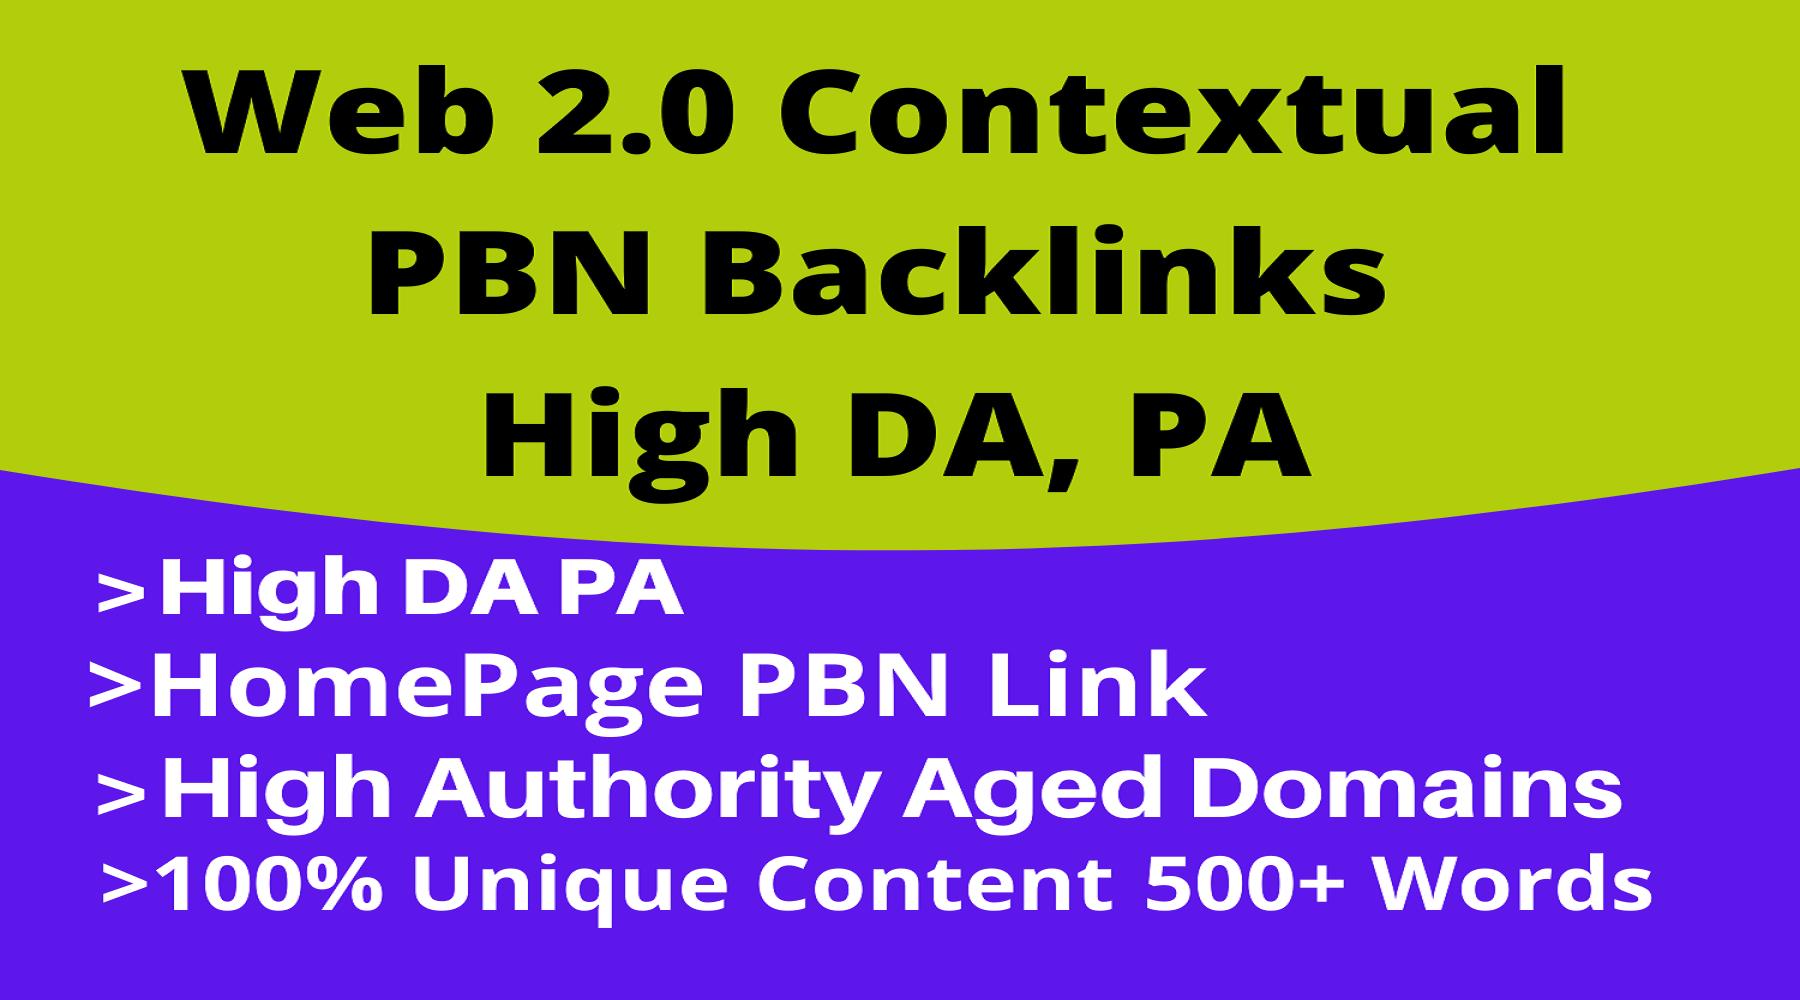 45 Web 2.0 Contextual PBN Backlinks Get Website Ranks Fast